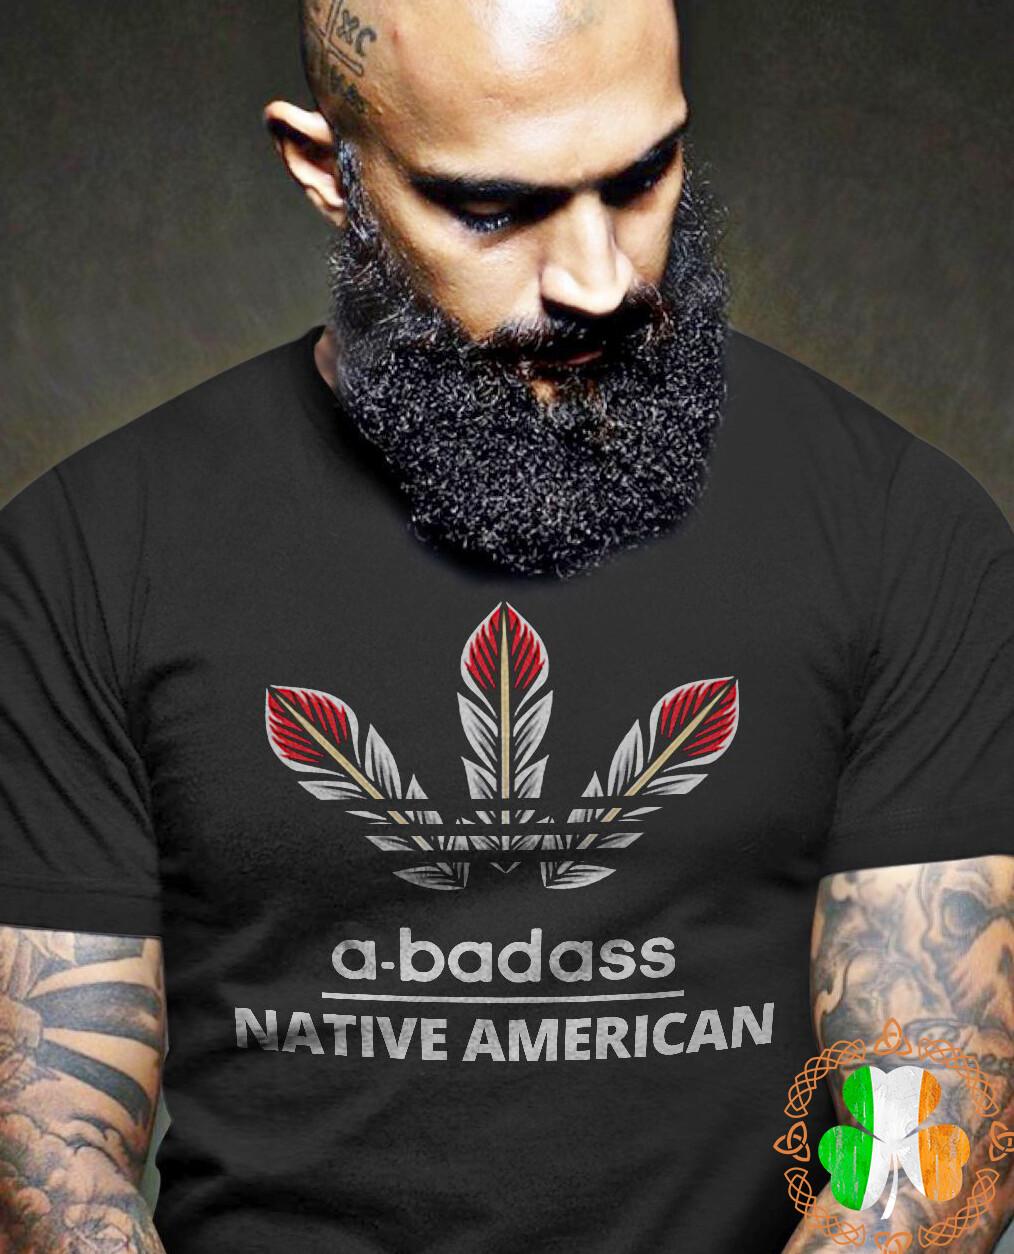 A-badass native american shirt